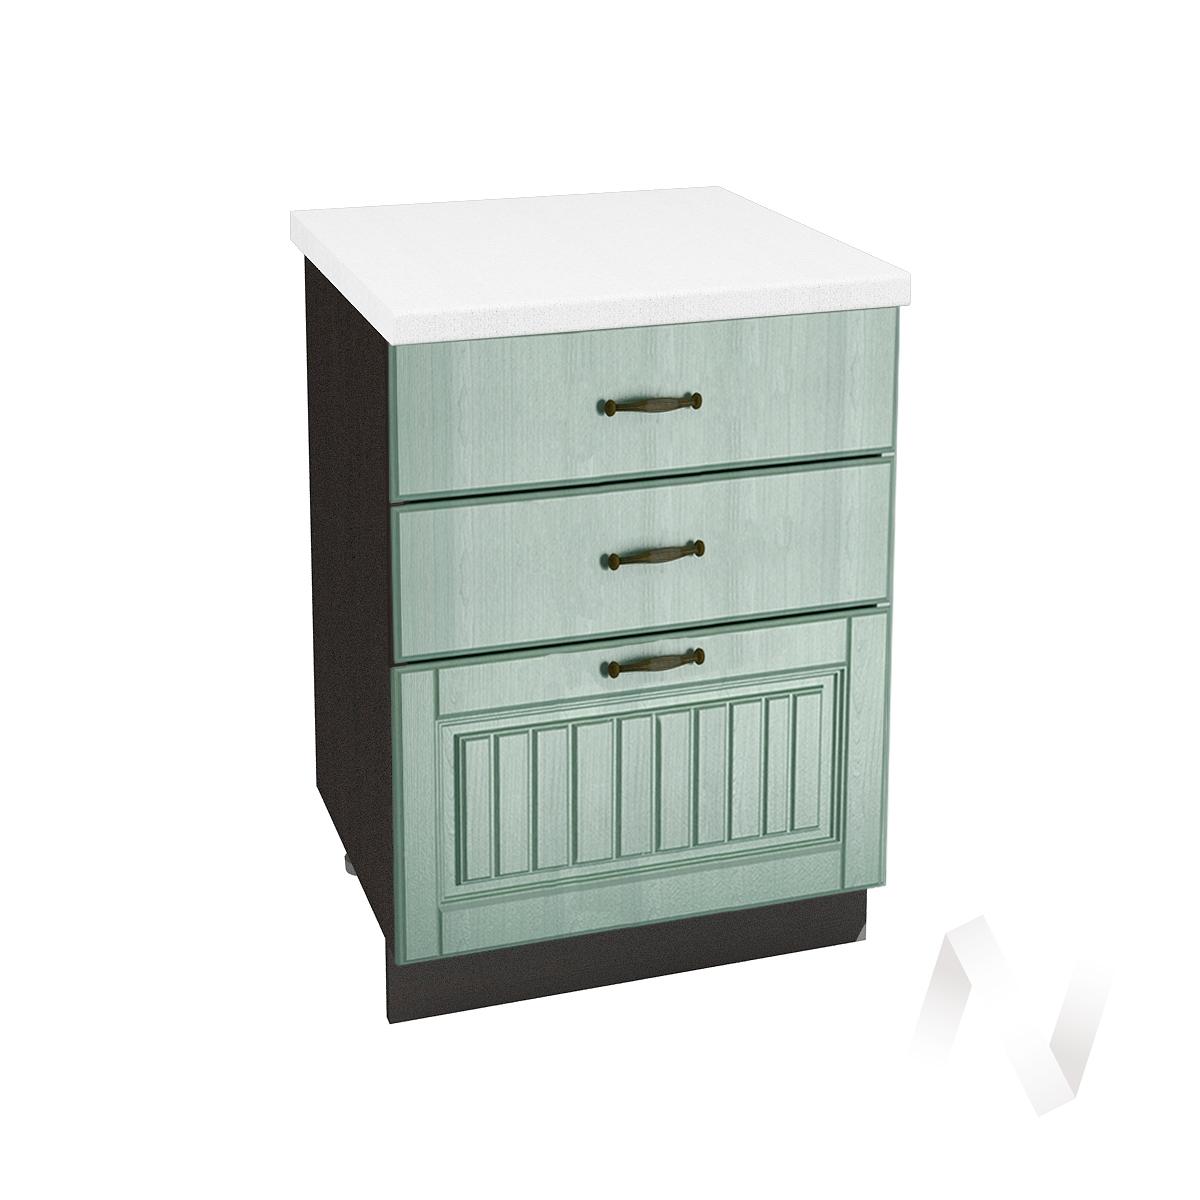 "Кухня ""Прованс"": Шкаф нижний с 3-мя ящиками 600, ШН3Я 600 (корпус венге)"